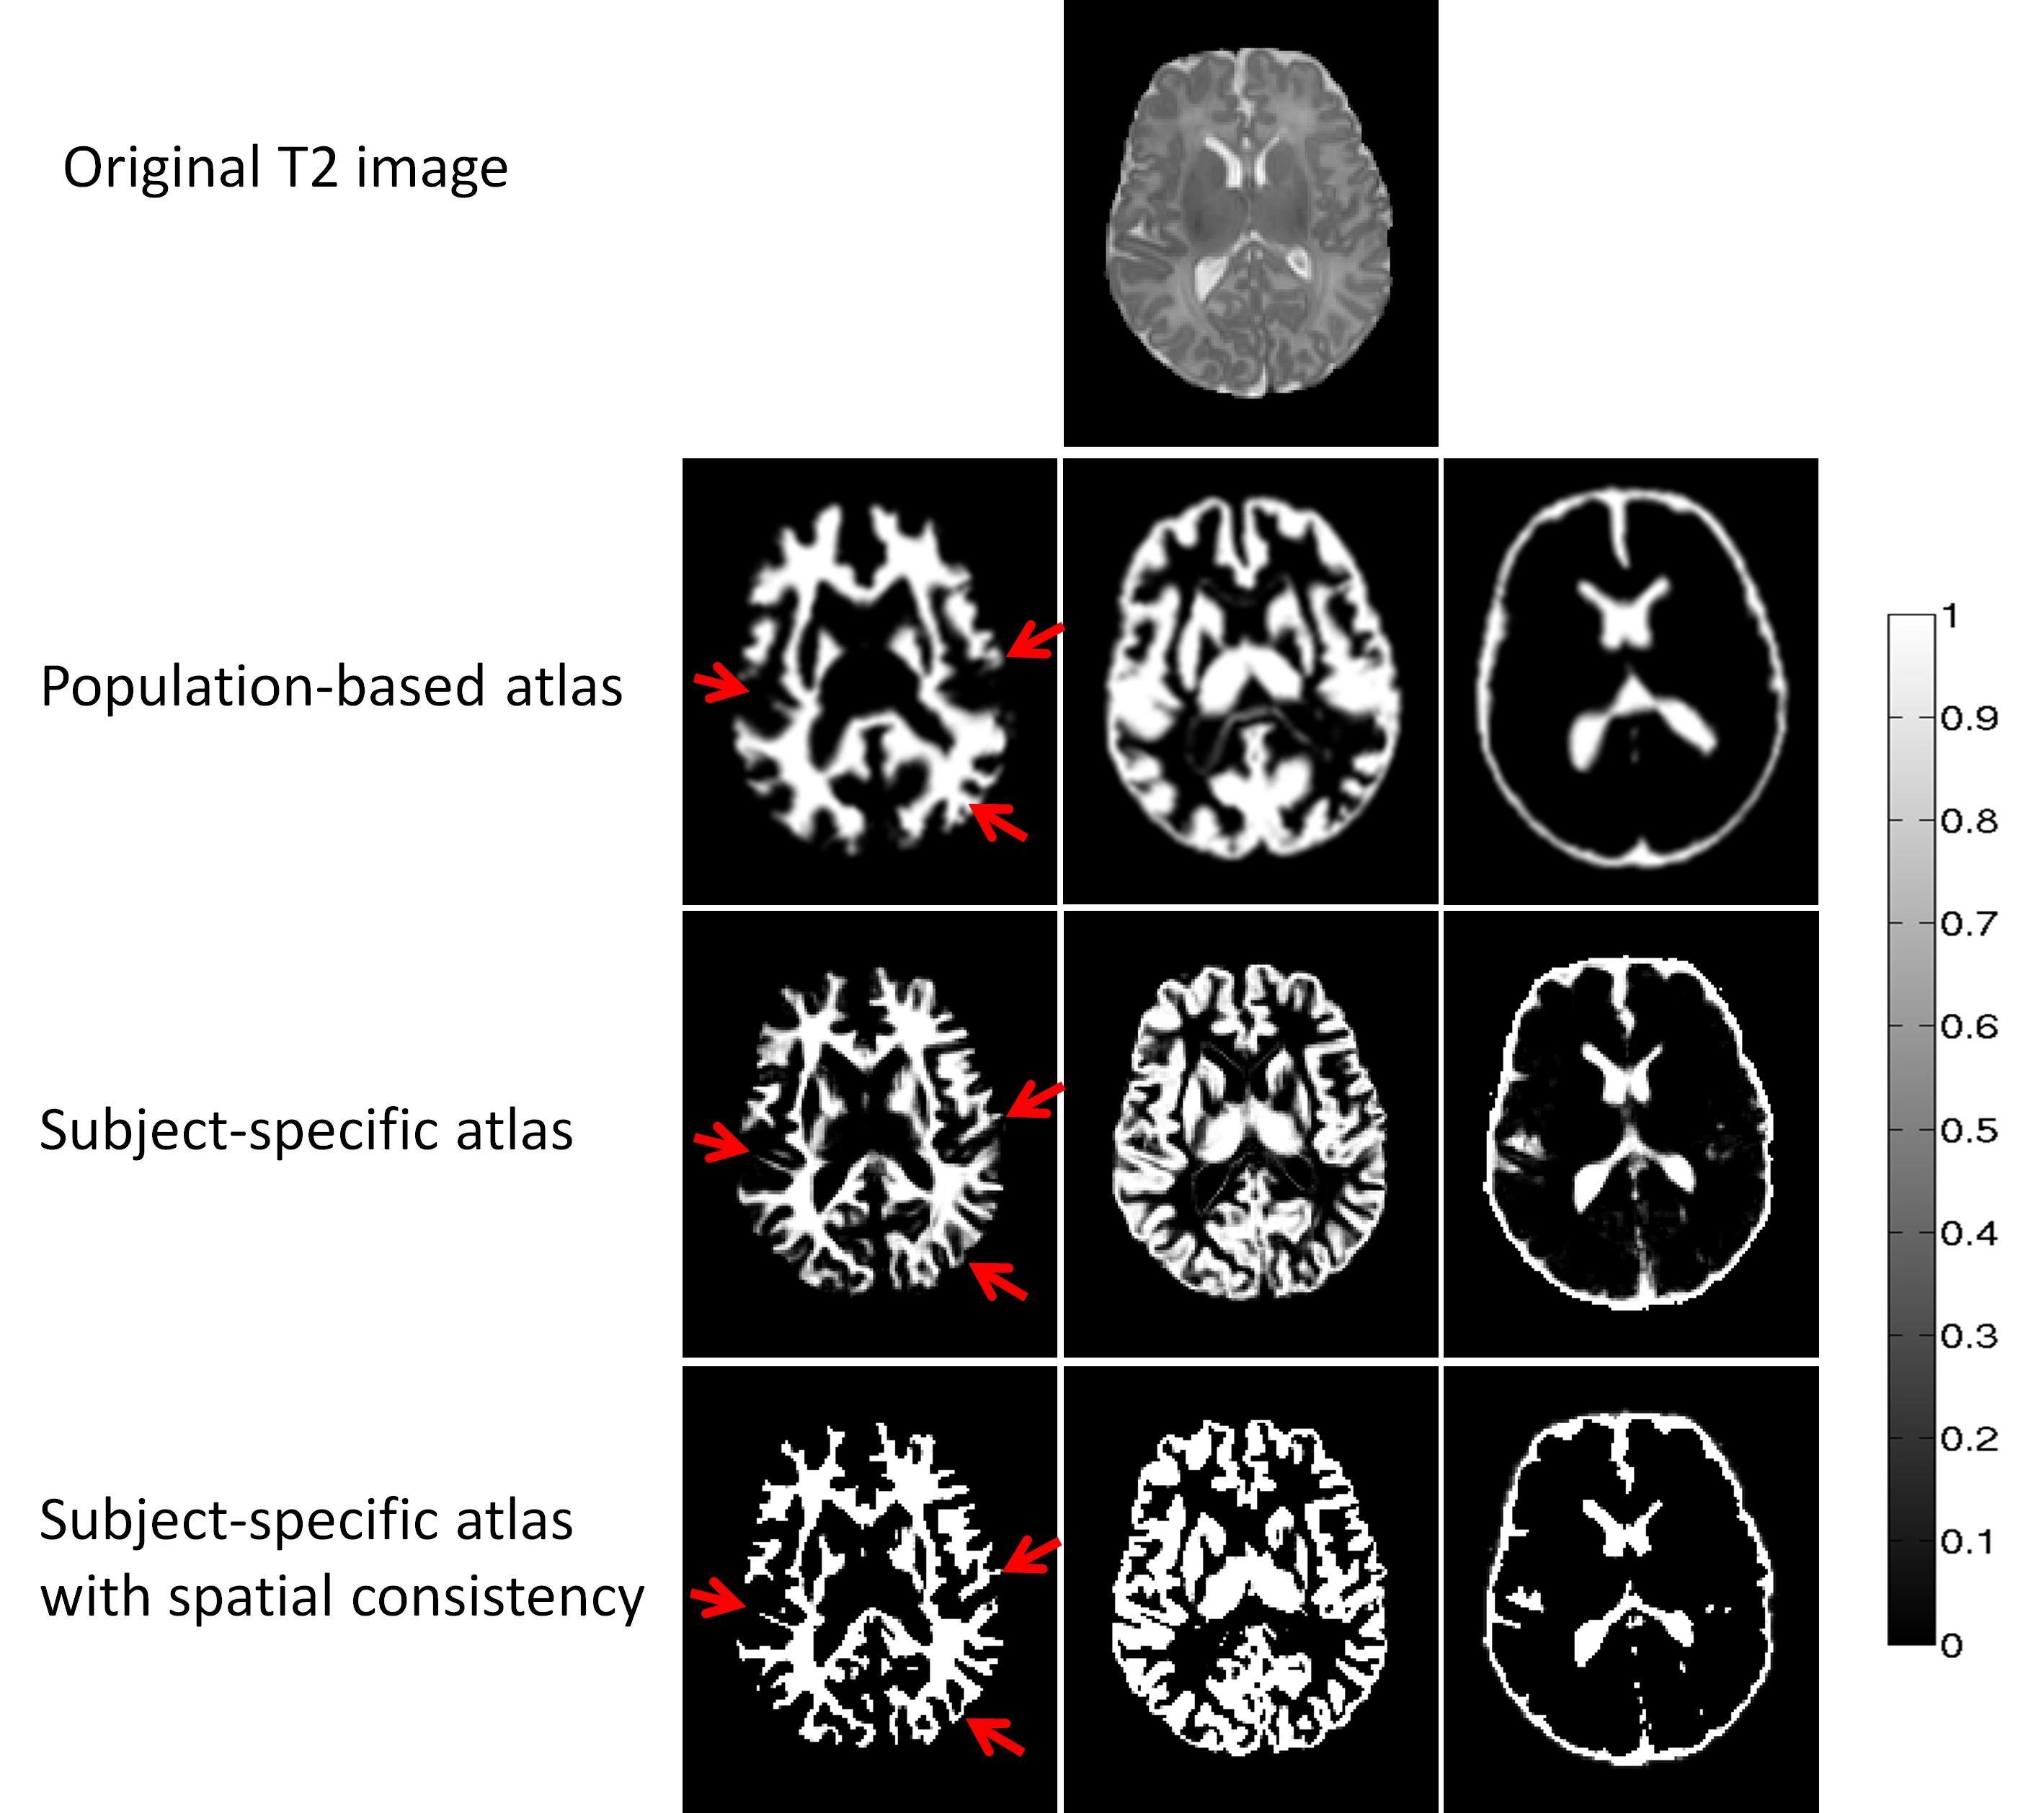 Neonatal Brain MR Image Segmentation using Patch-Driven Level Sets